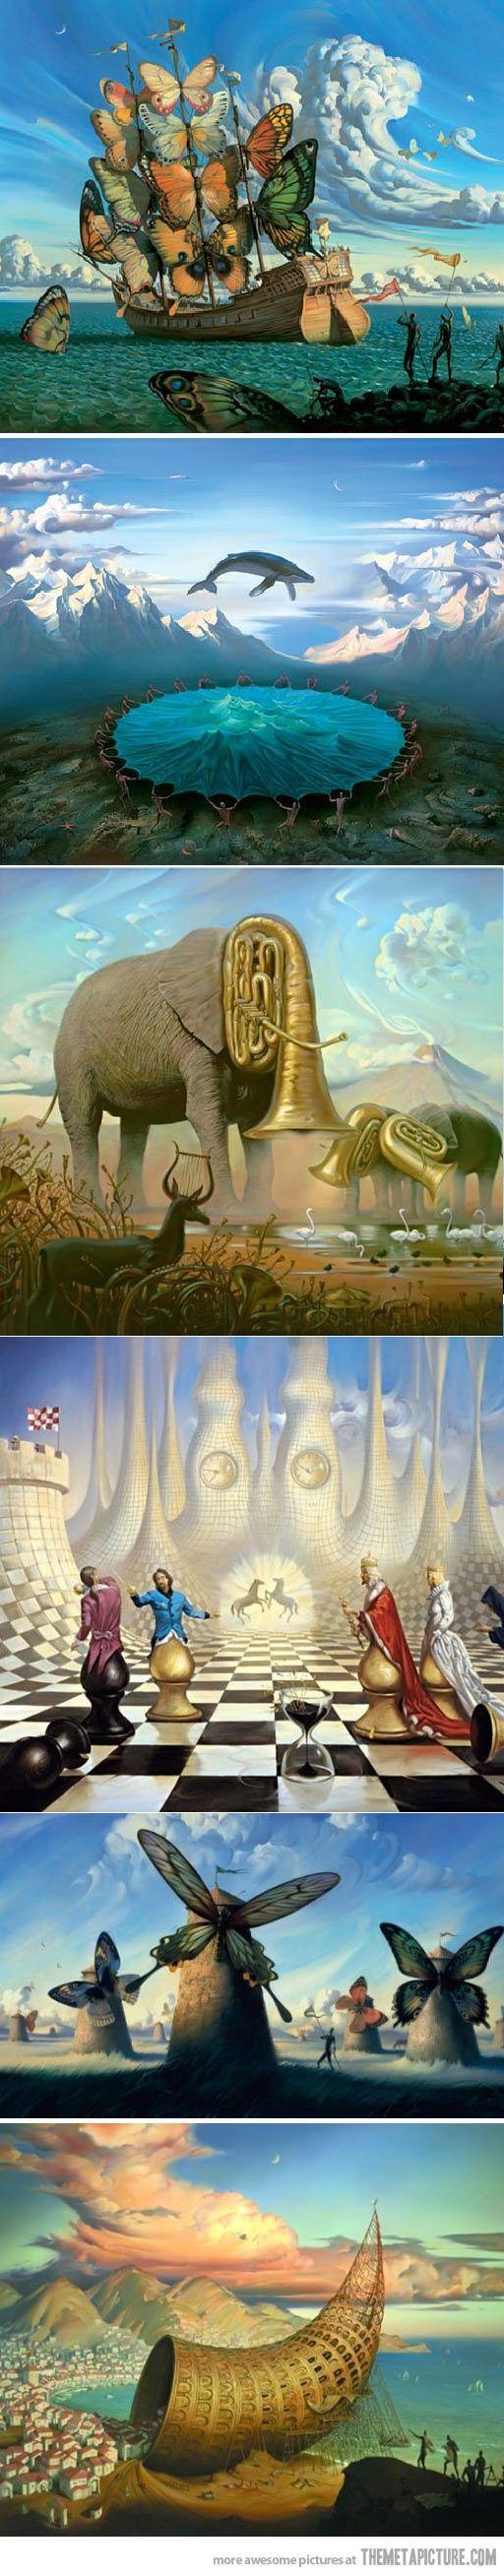 Surrealistic Painter: Vladimir Kush. Surrealist art is by far the best art